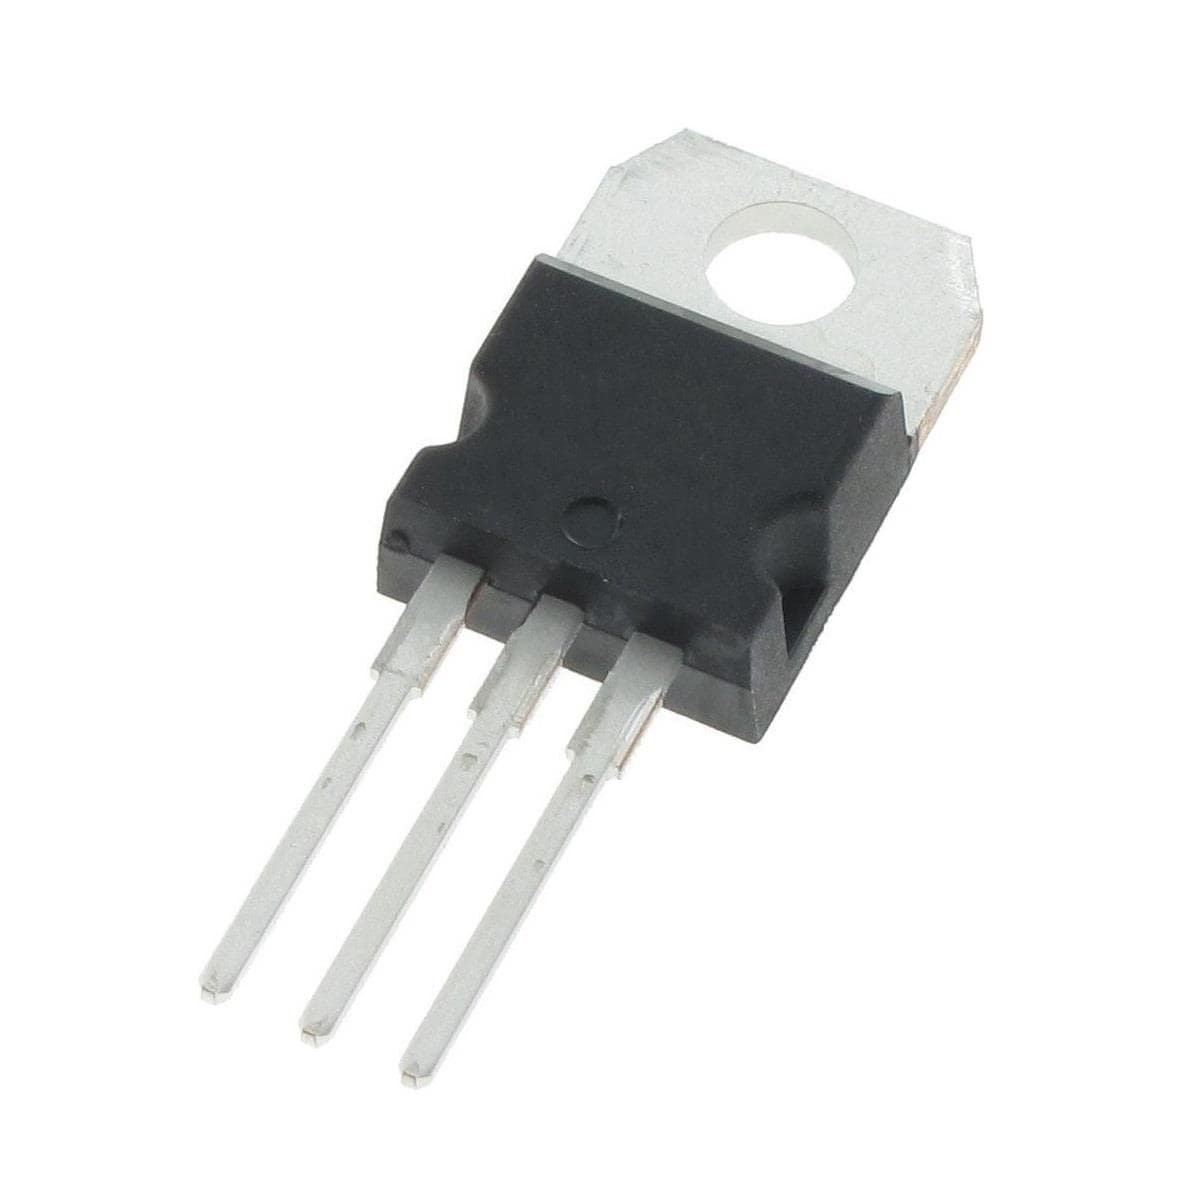 Power Transistor MJE15032G 80418